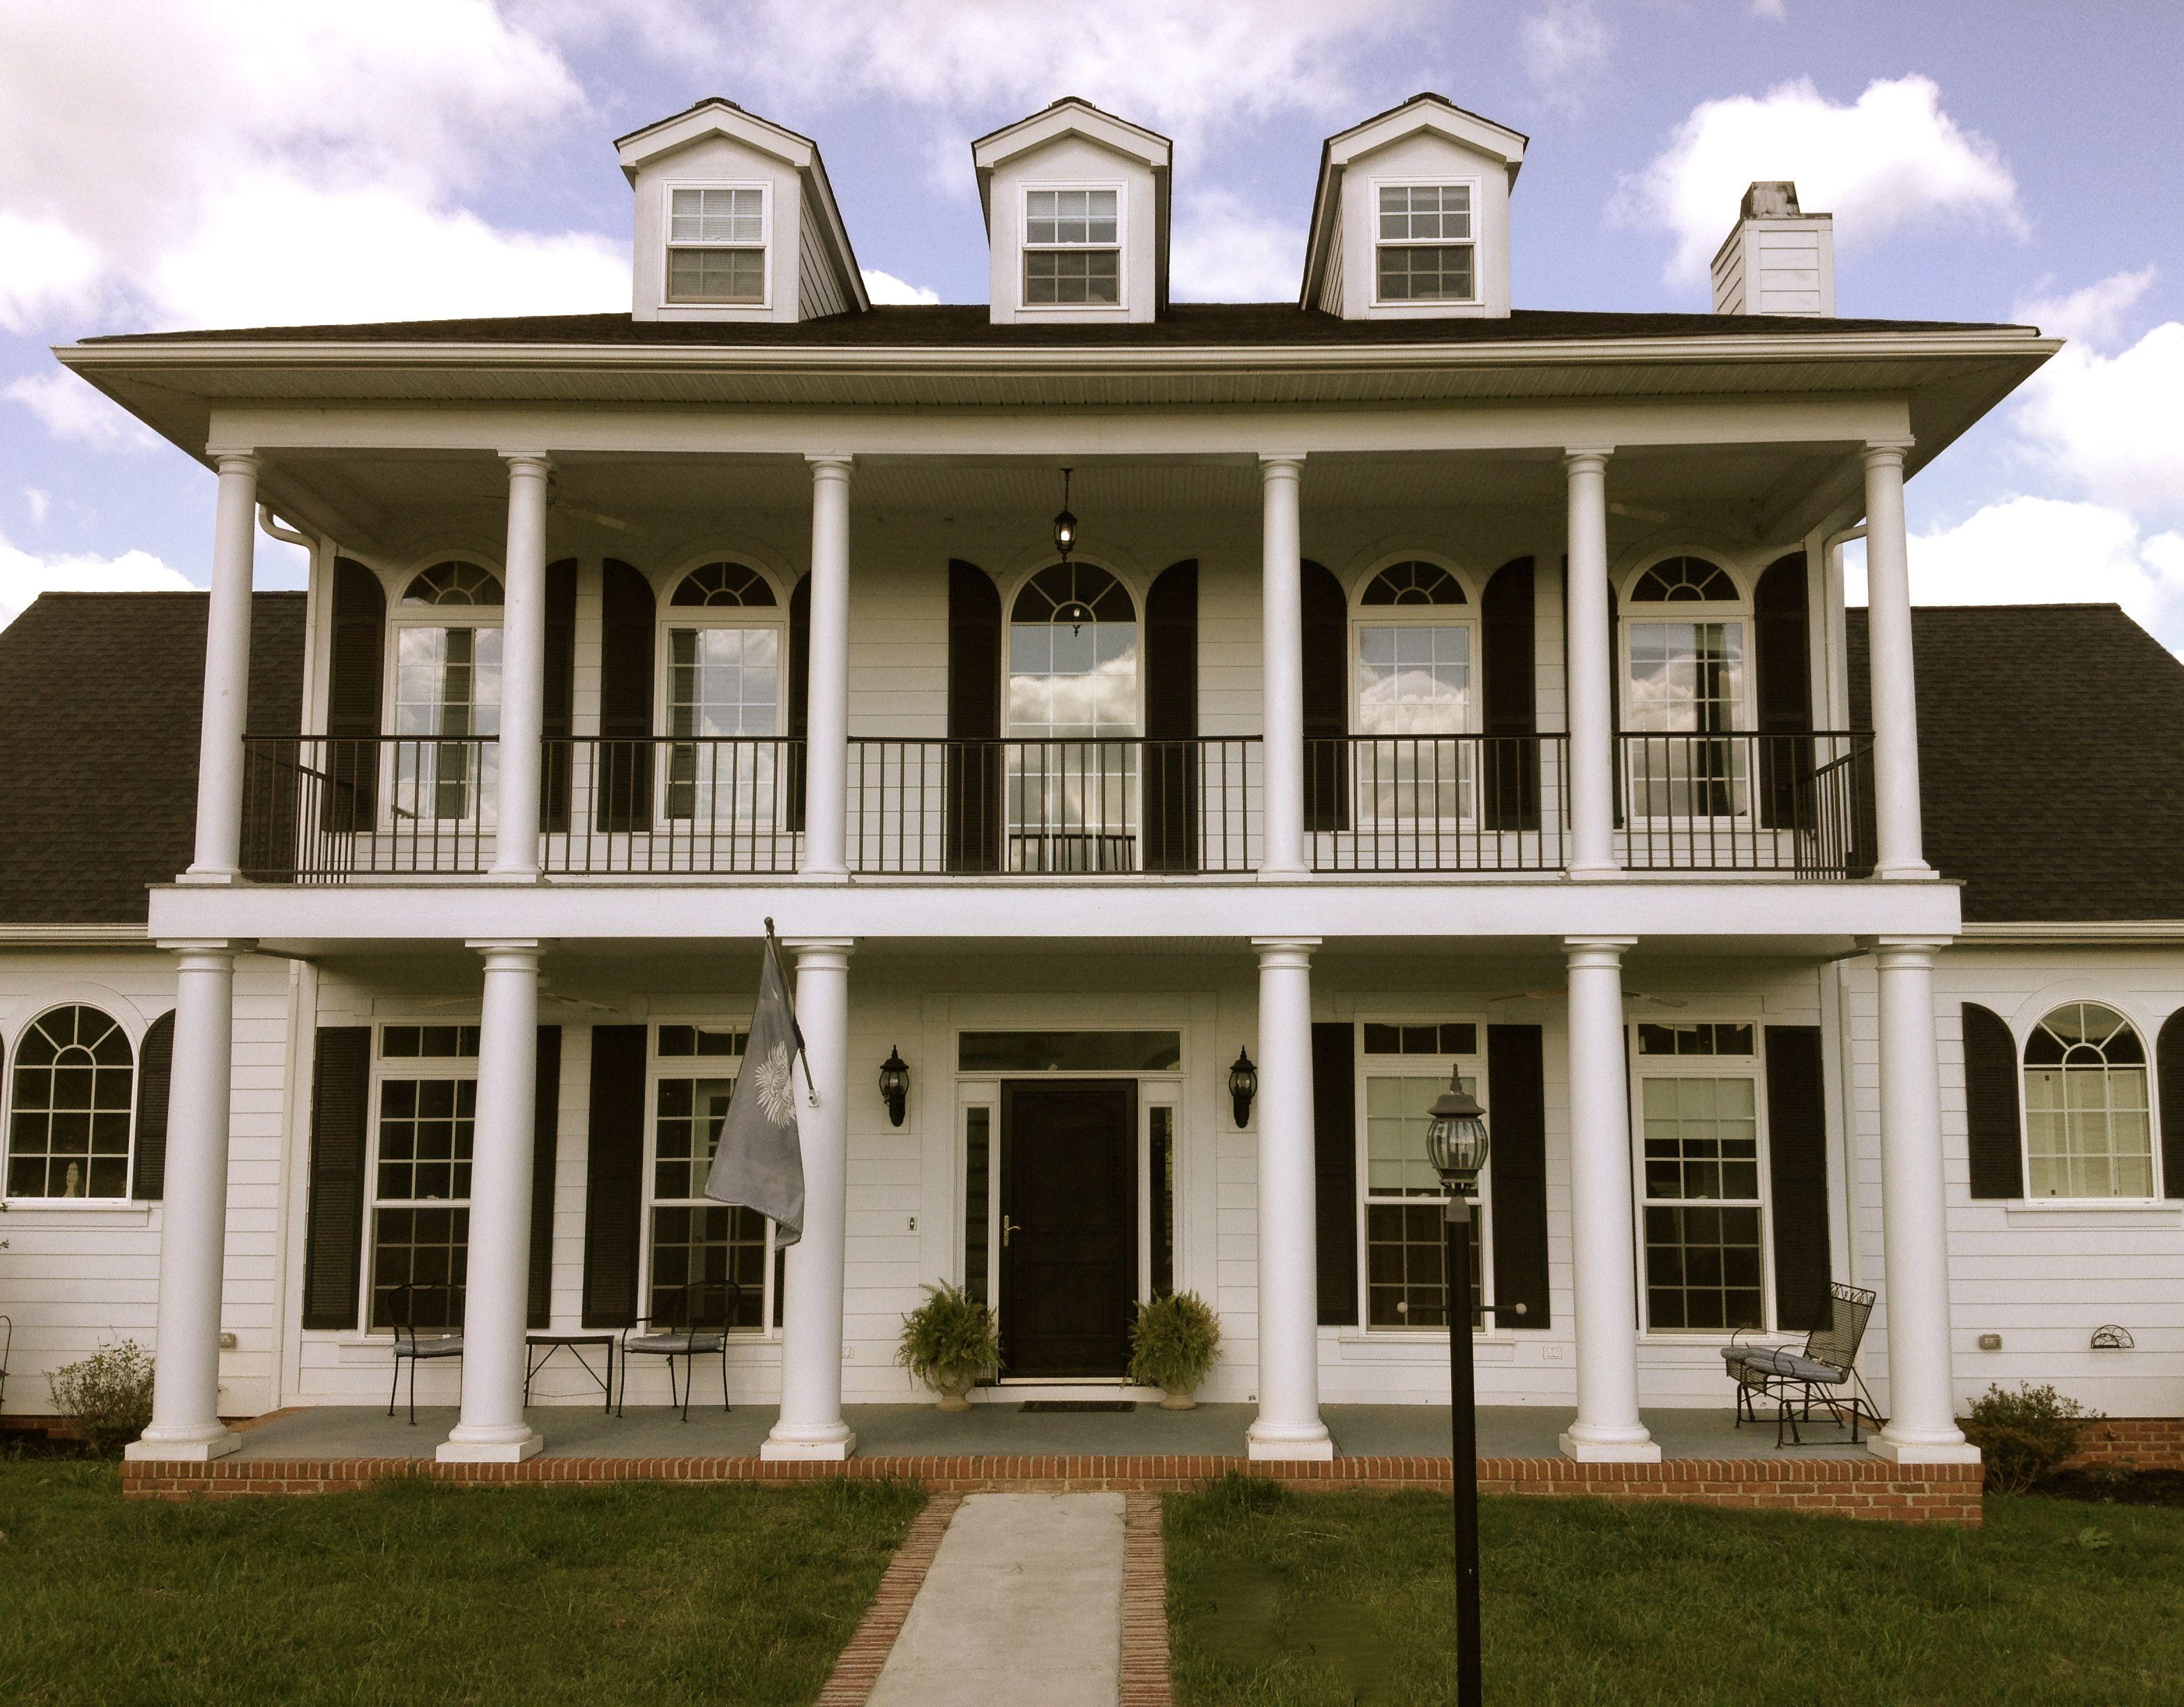 Wedding venues in virginia beach va  The Alder House Plantation Greenville SC Wedding and Receptions